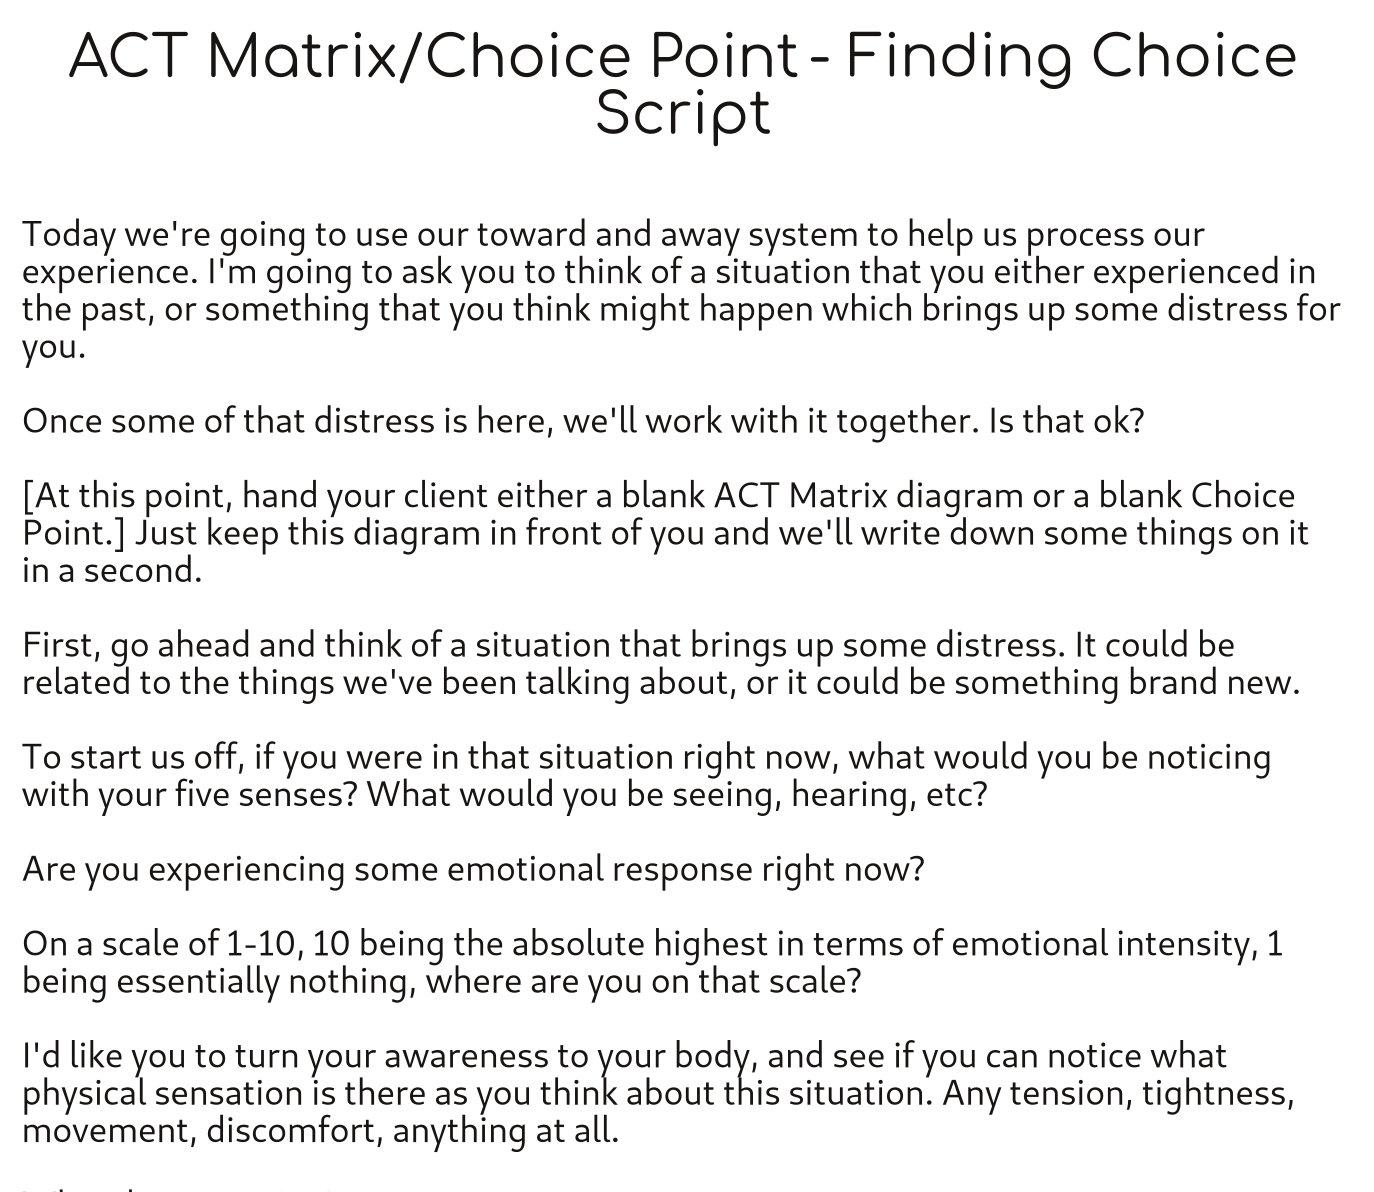 Finding Choice Script.jpg